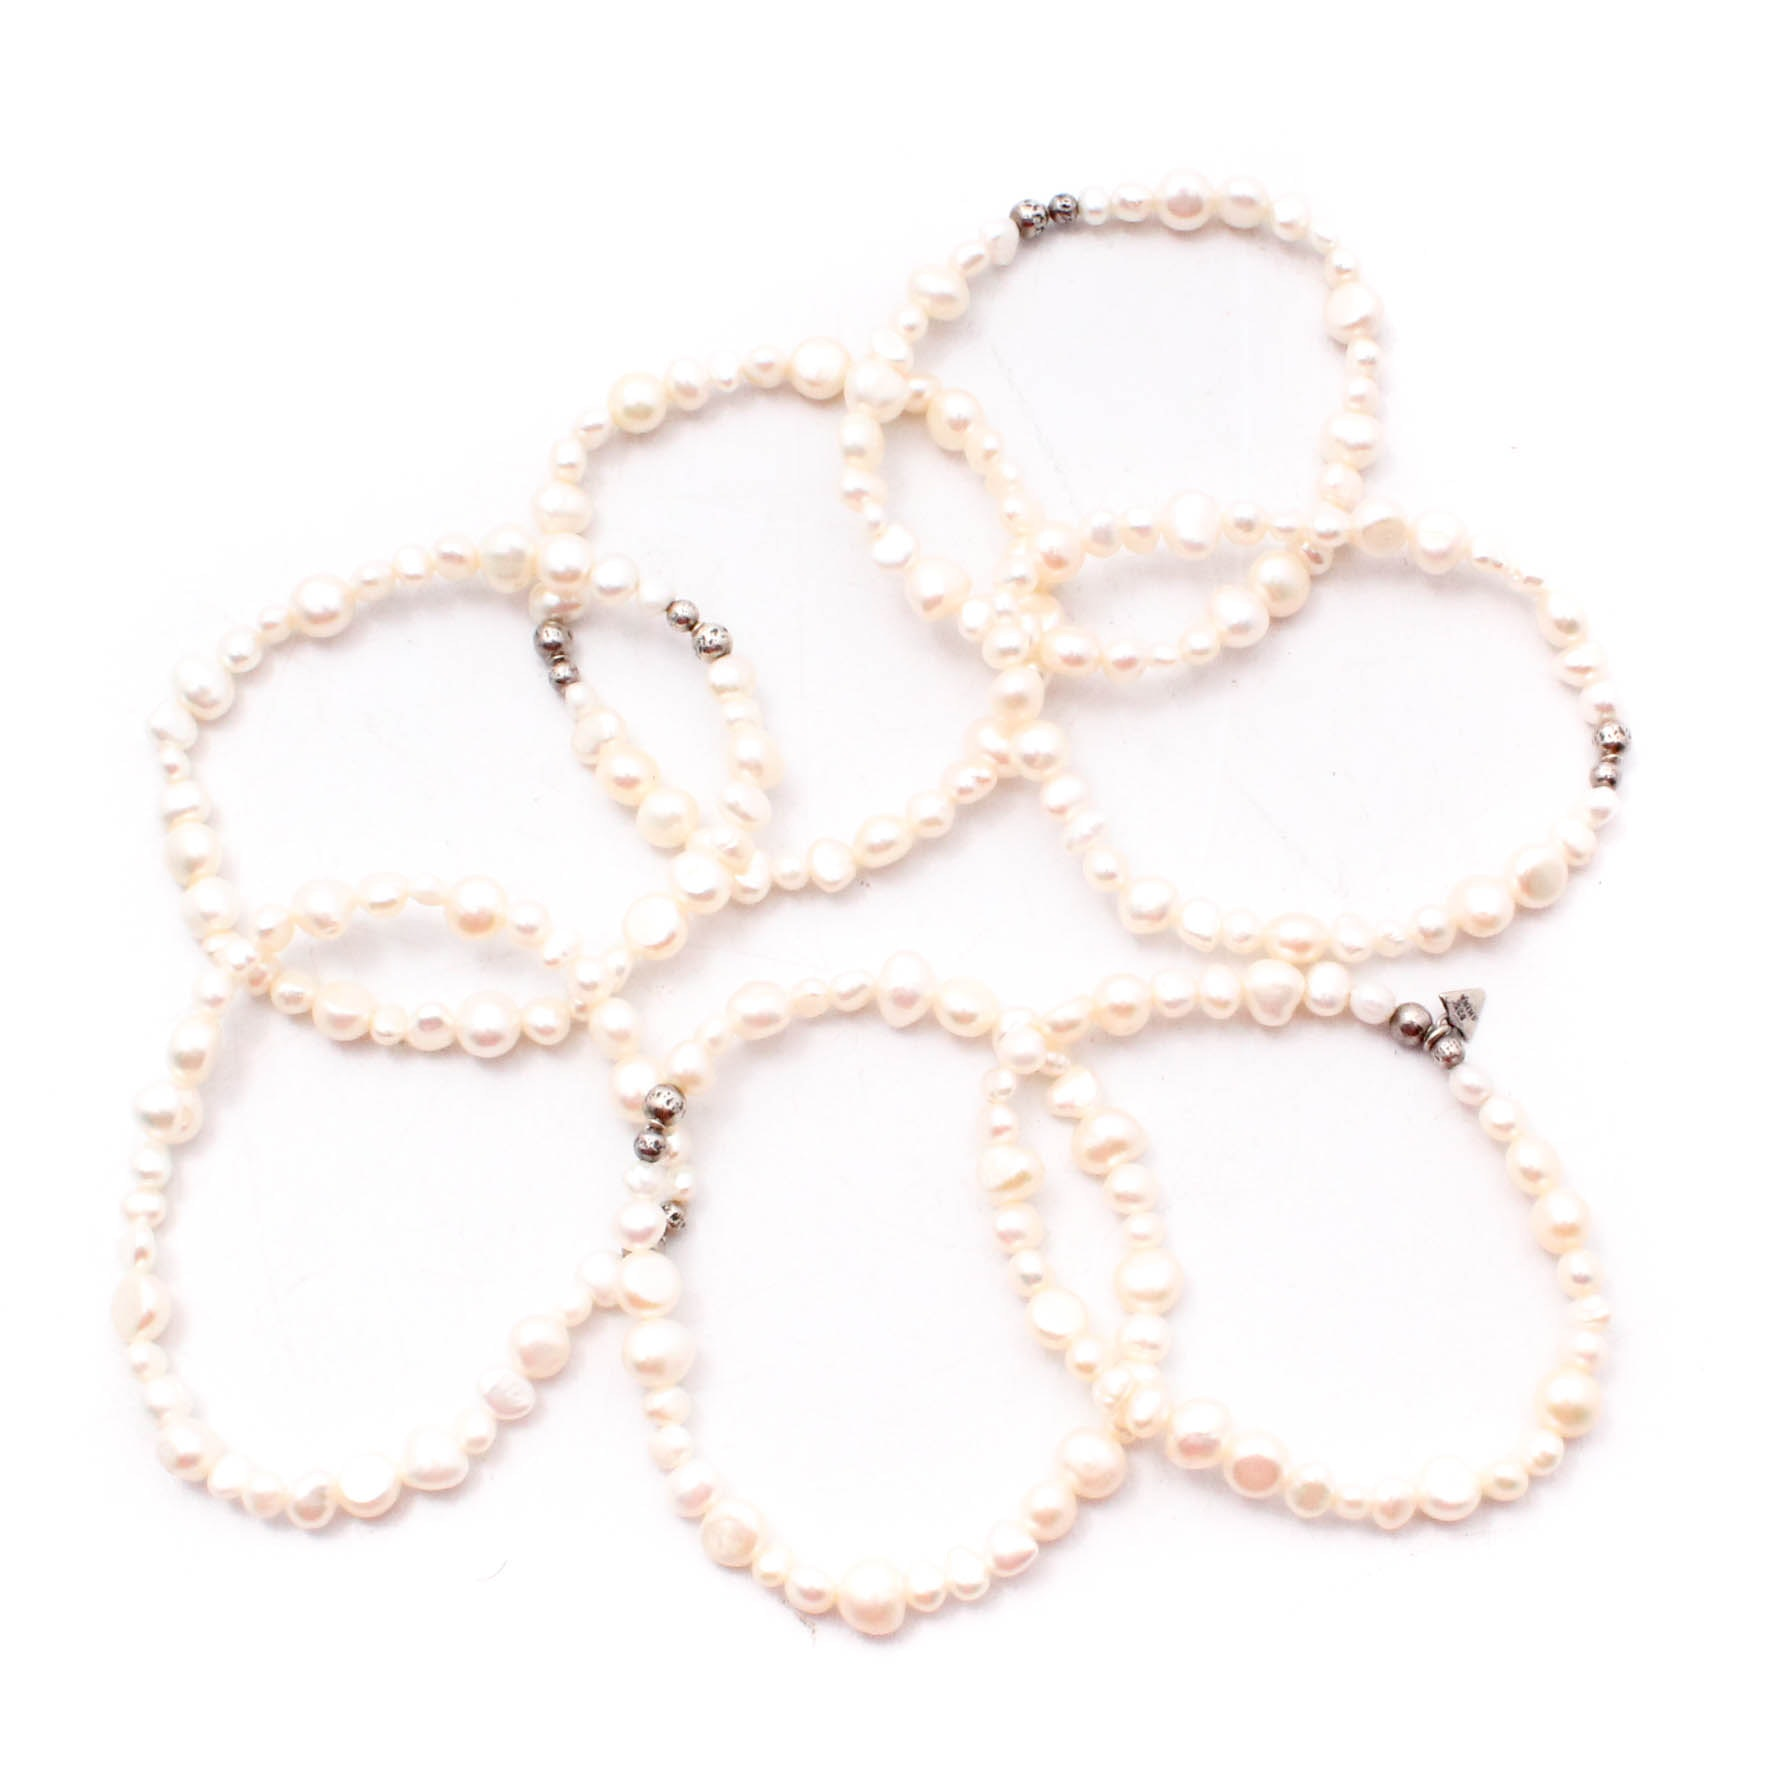 Silpada Sterling Silver Freshwater Cultured Pearl Bracelets